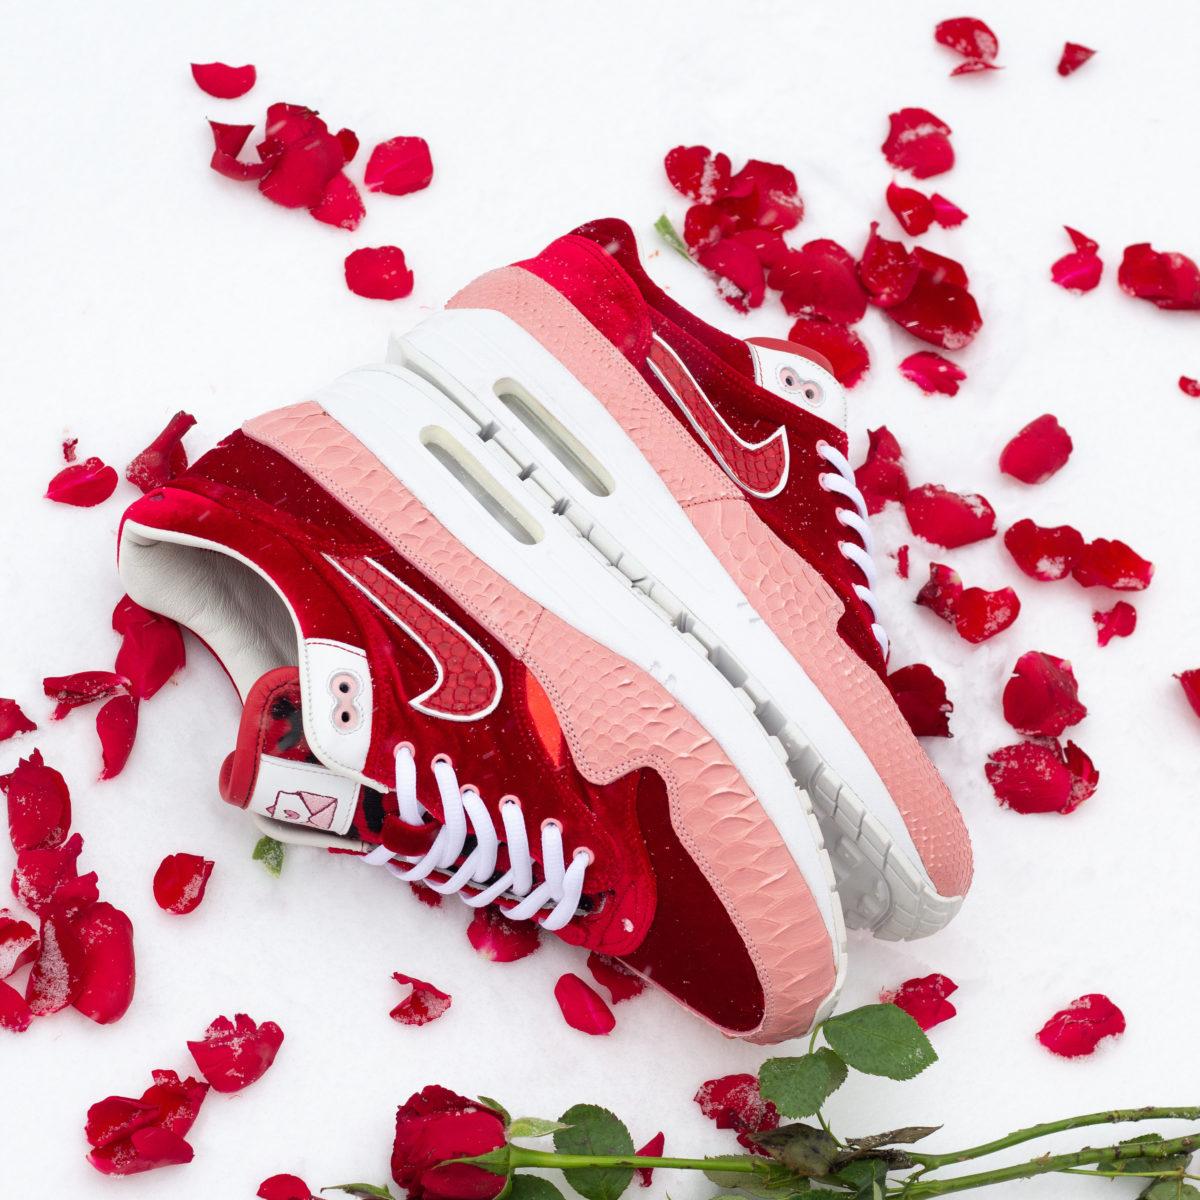 Vijz Bespokes Customized Sneakers